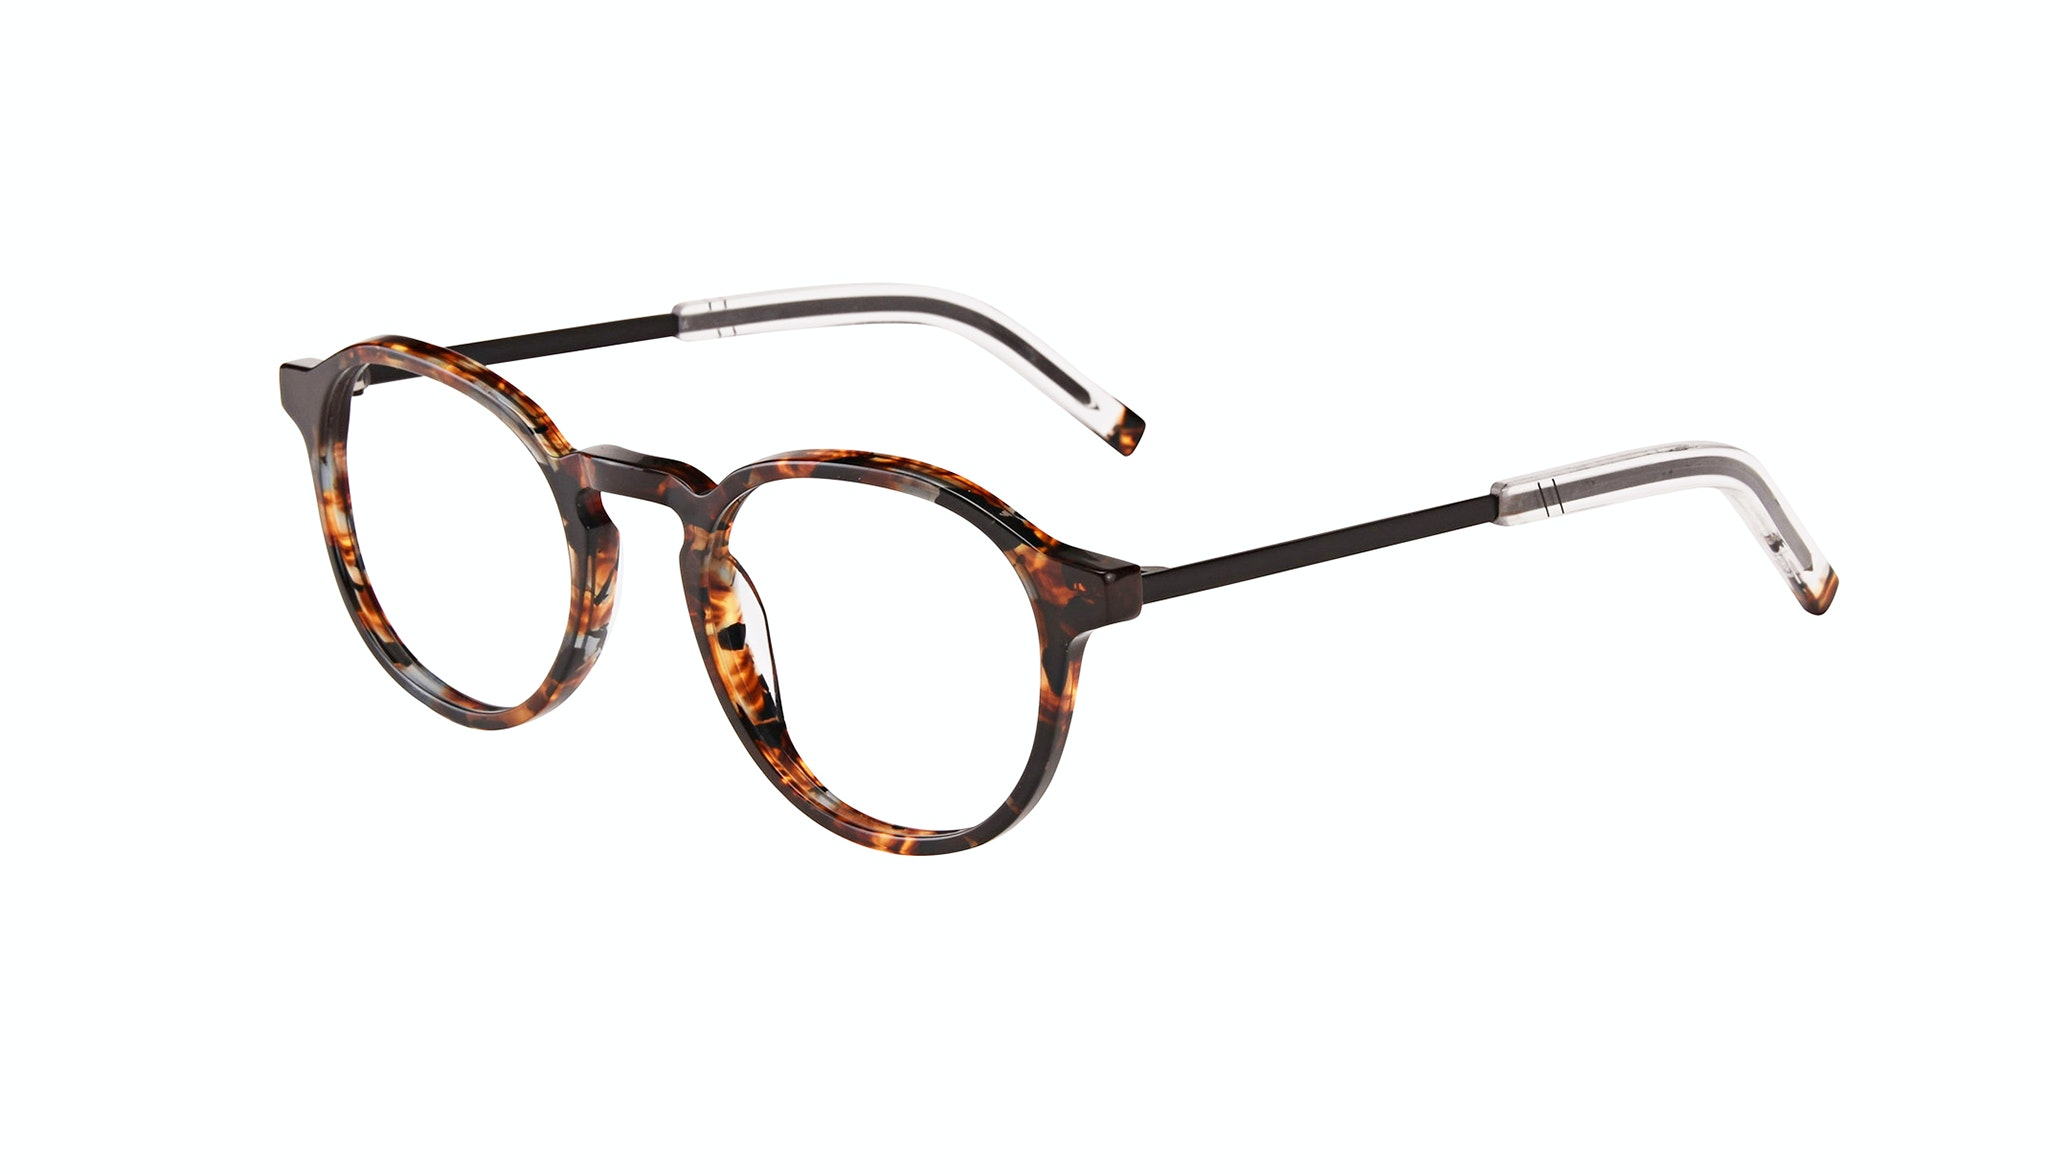 Affordable Fashion Glasses Round Eyeglasses Men Prime XL Mahogany Tilt